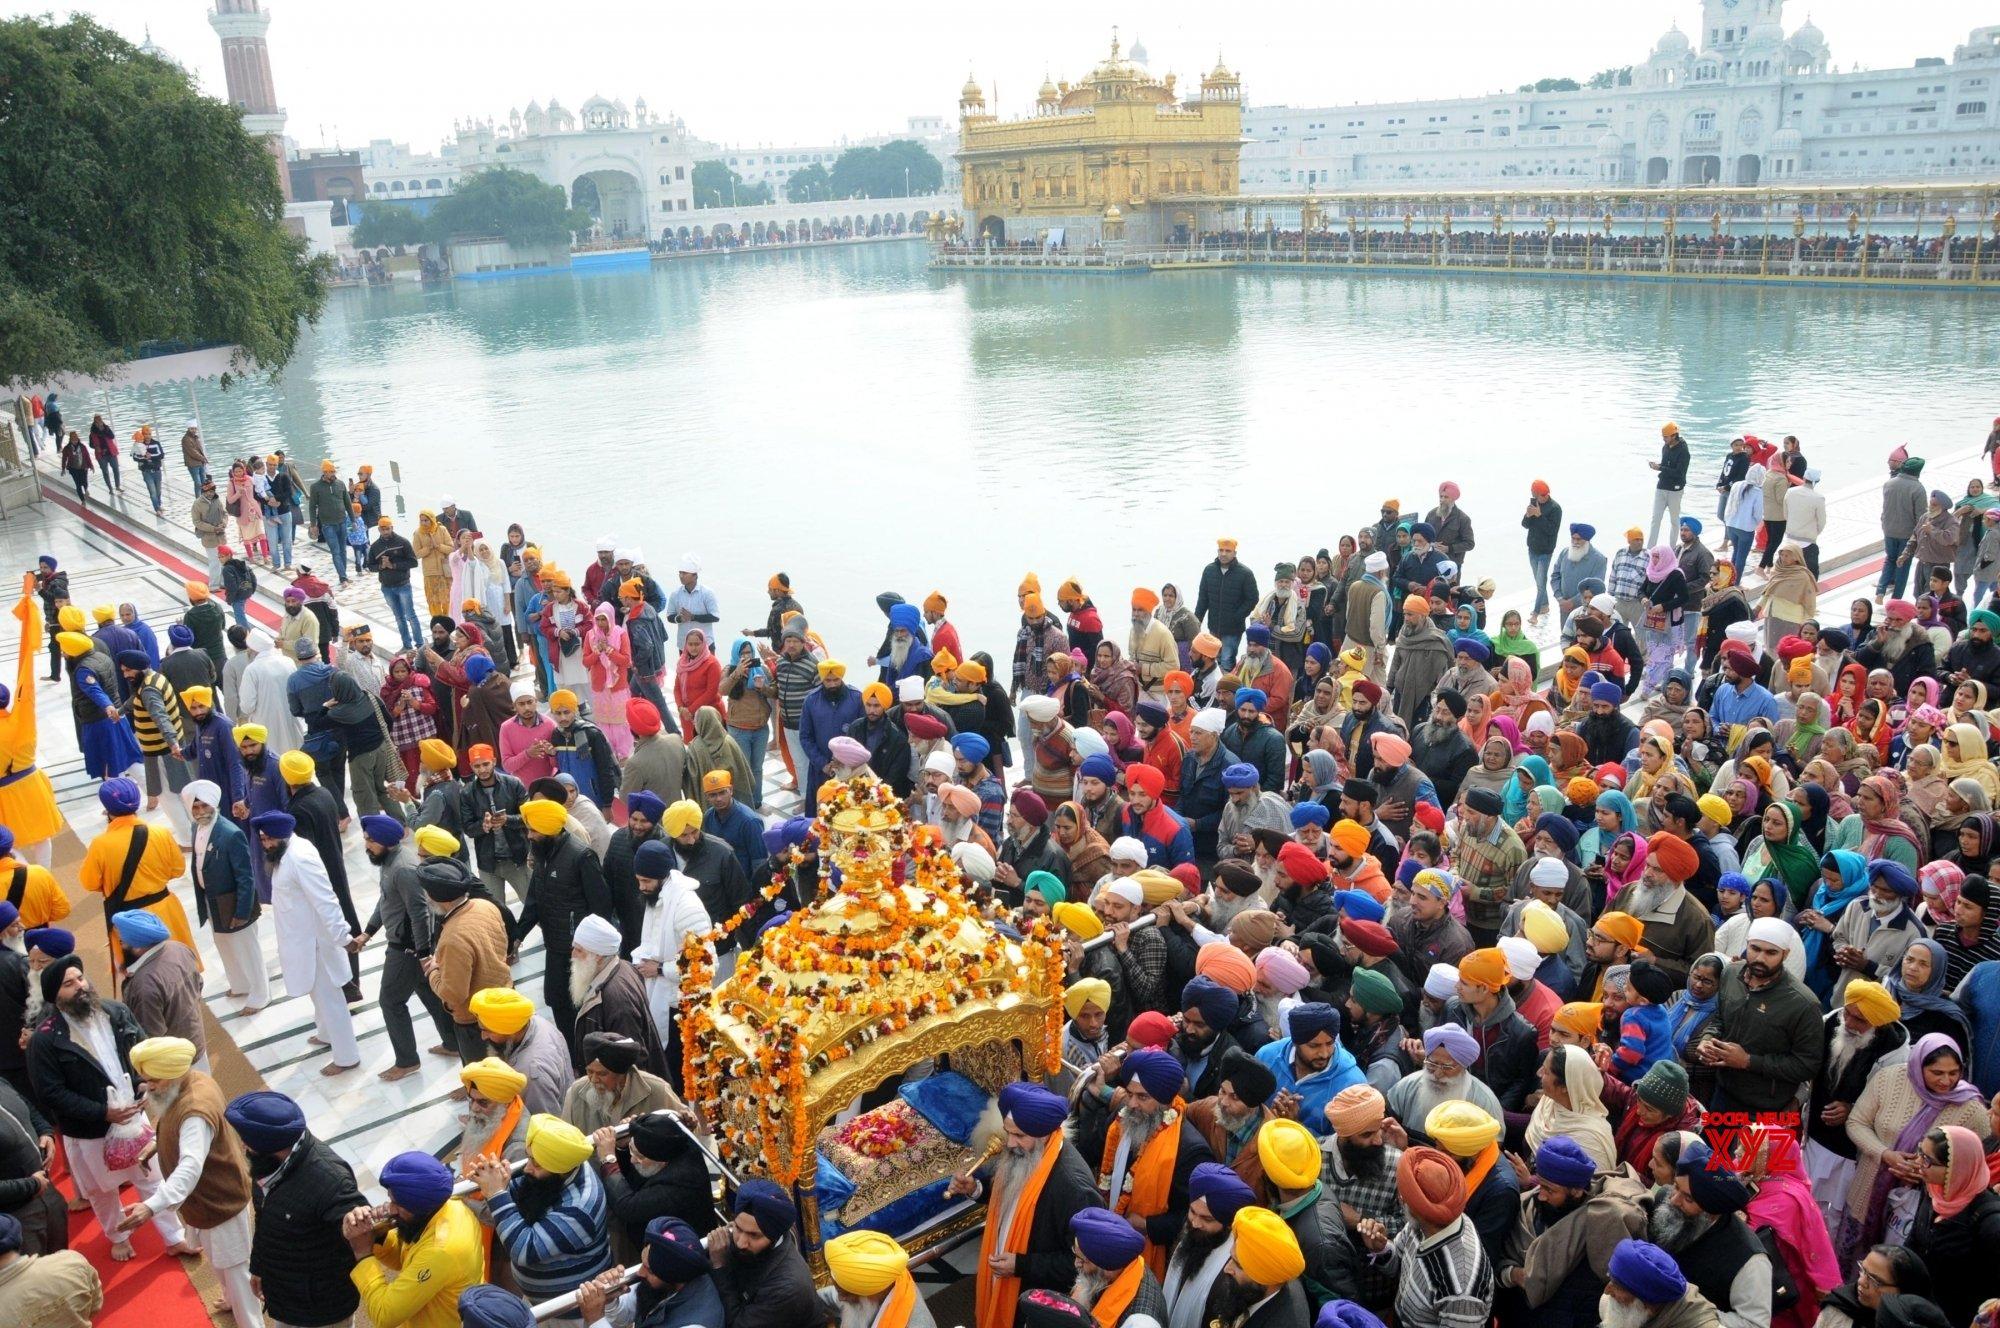 Devotees throng gurdwaras to mark Guru Gobind Singh's birth anniversary